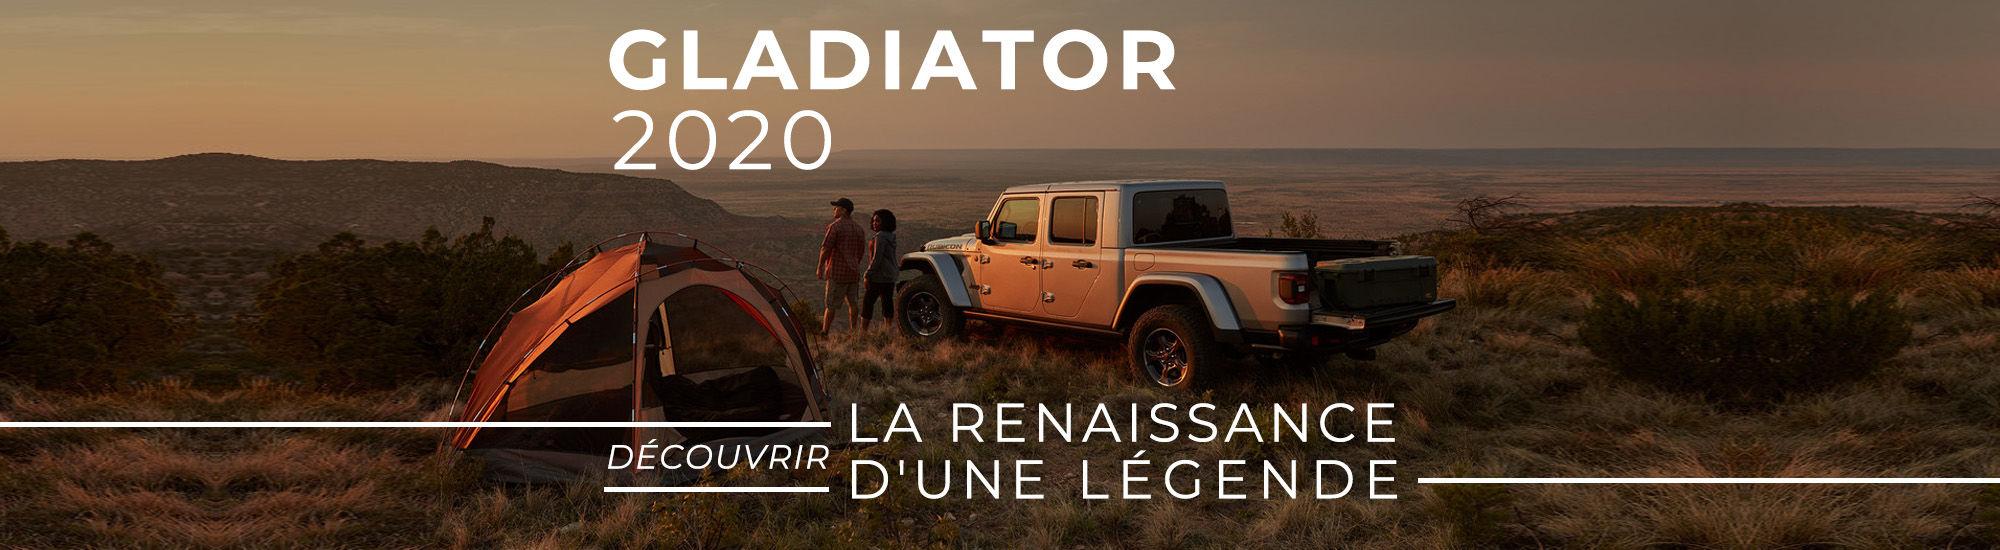 Gladiator 2020